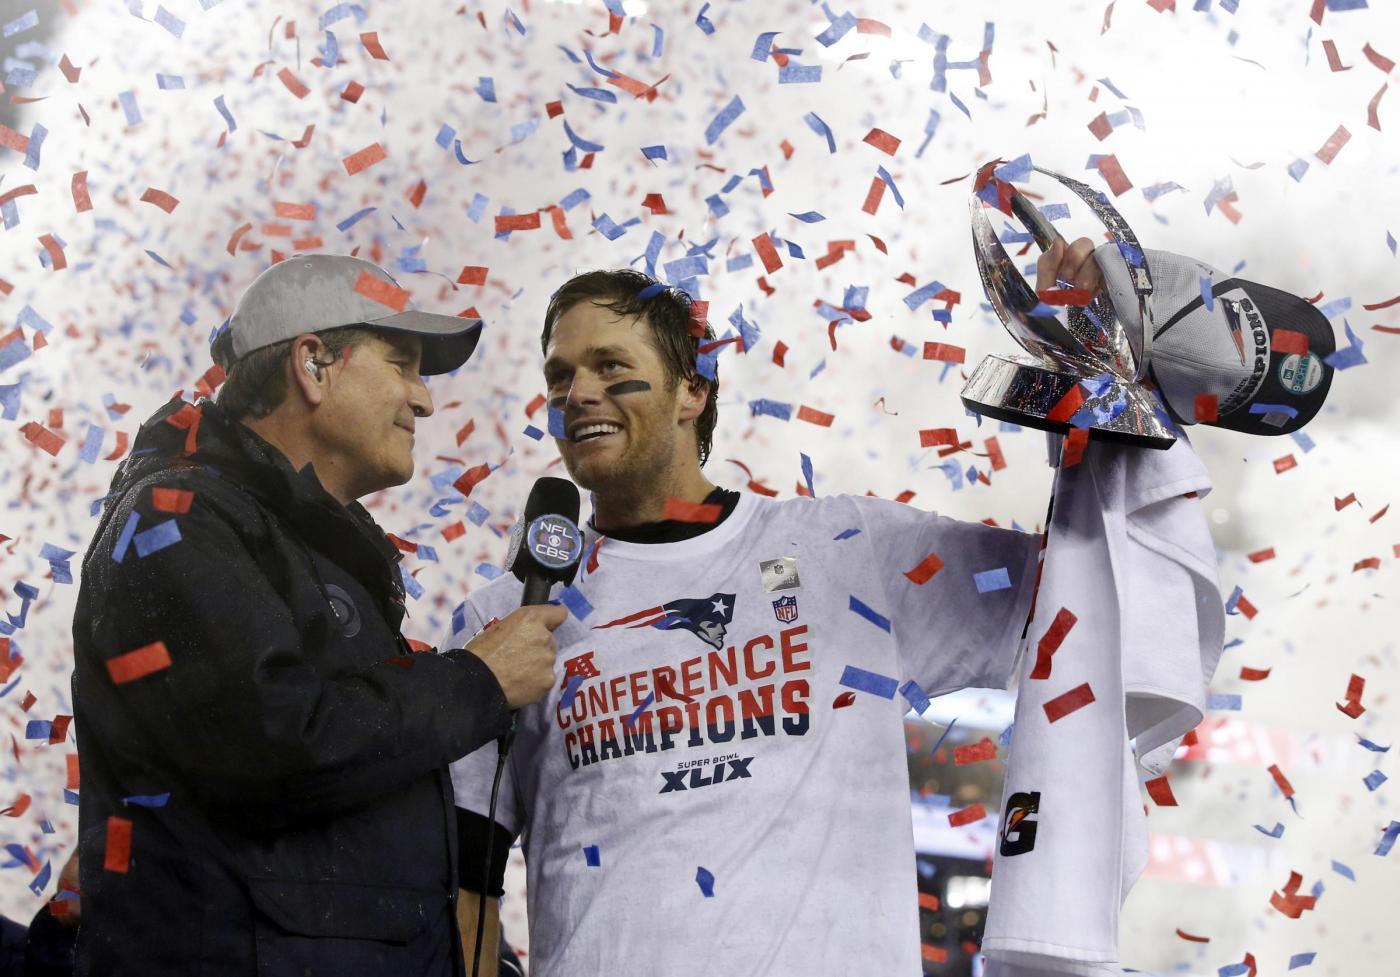 Super Bowl ai New England Patrios che battono Seattle Seahawks 28-24